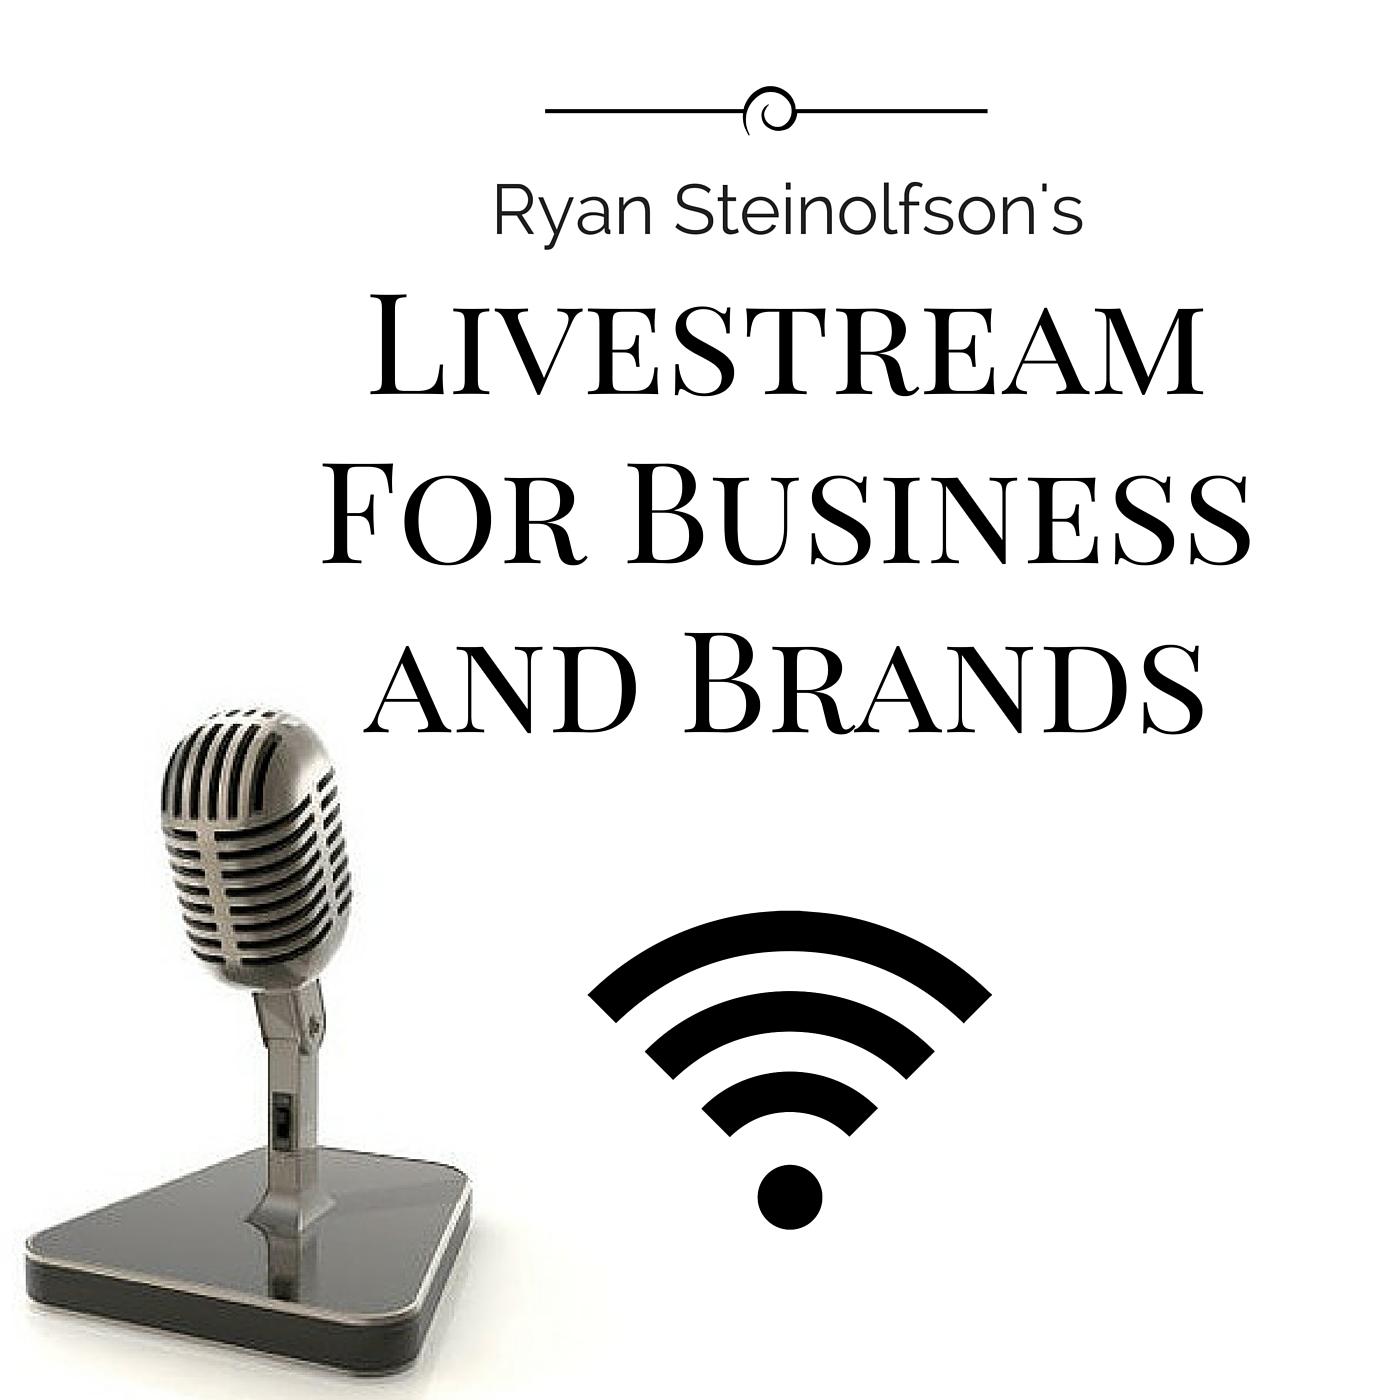 <![CDATA[Livestream For Business And Brands]]>